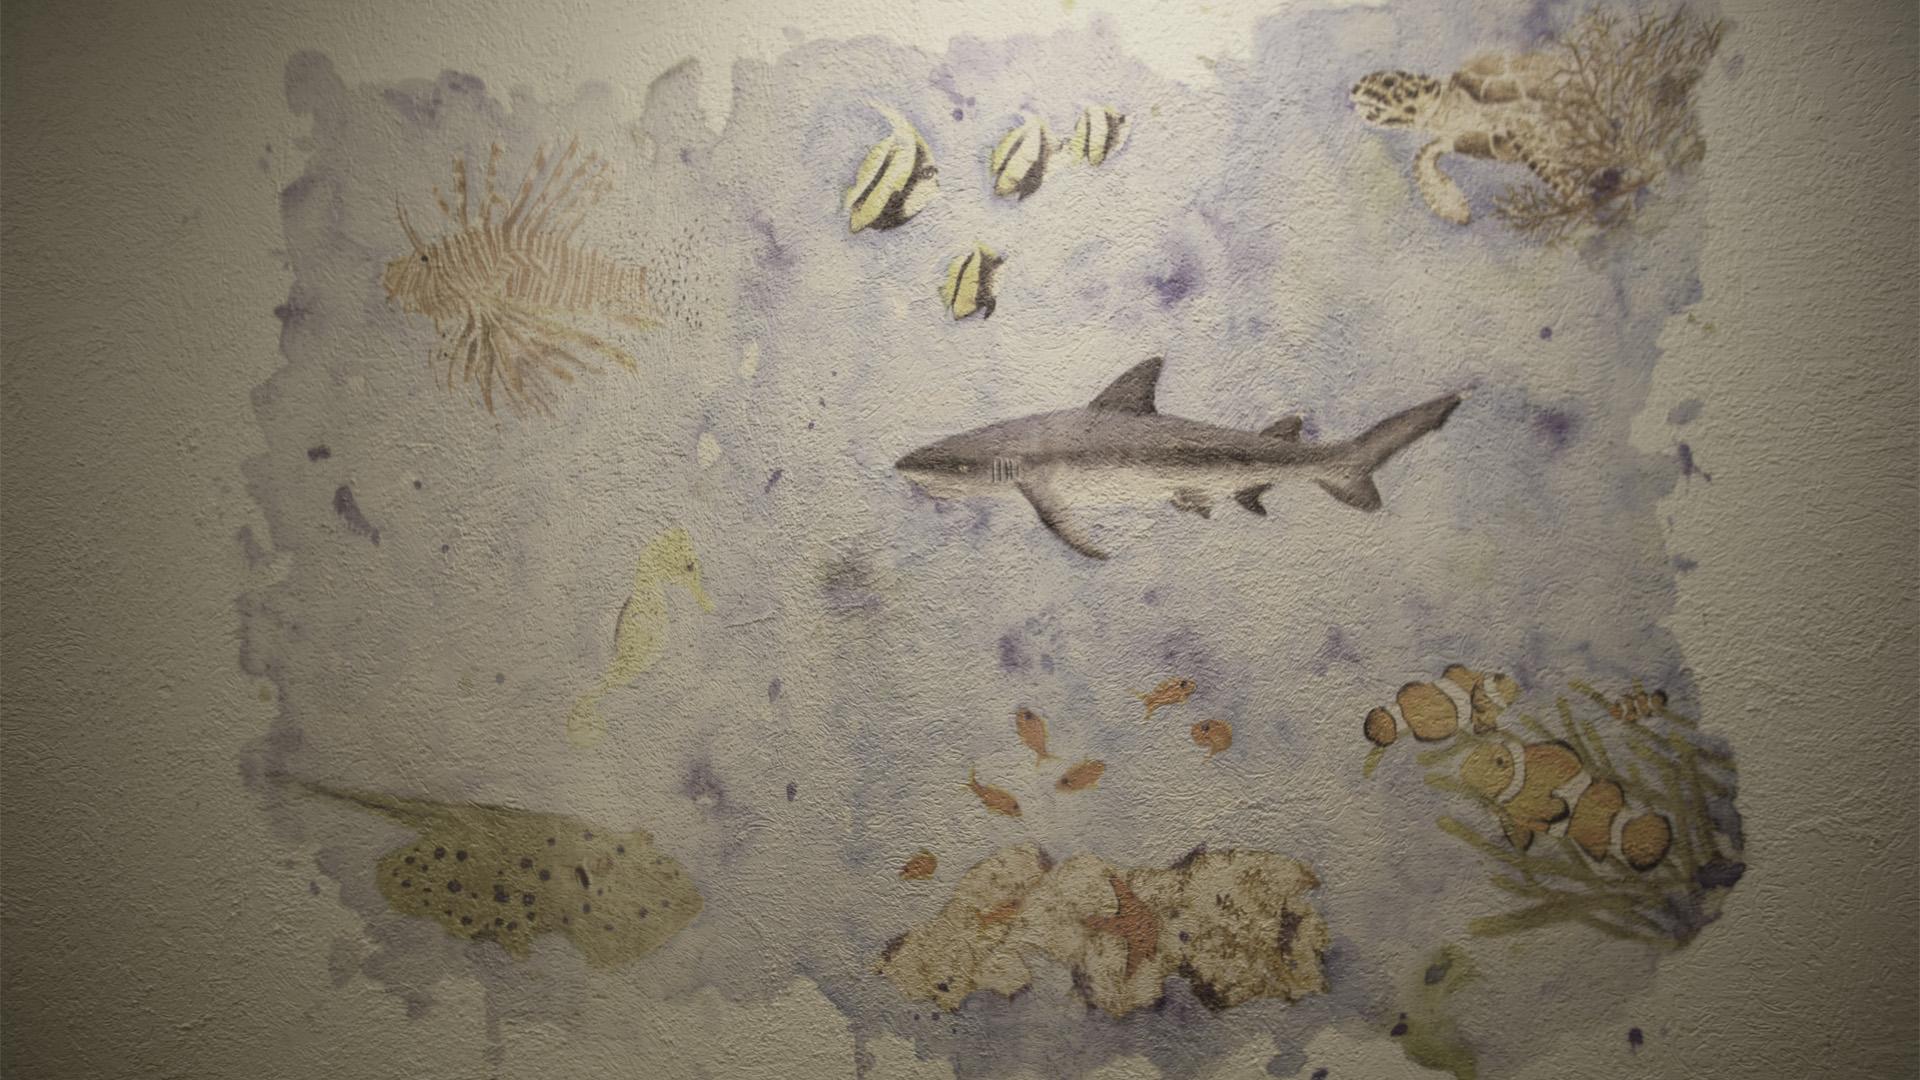 Aquarell, Gemälde, Digitalisierung, Wanddruck, Wanddtattoo